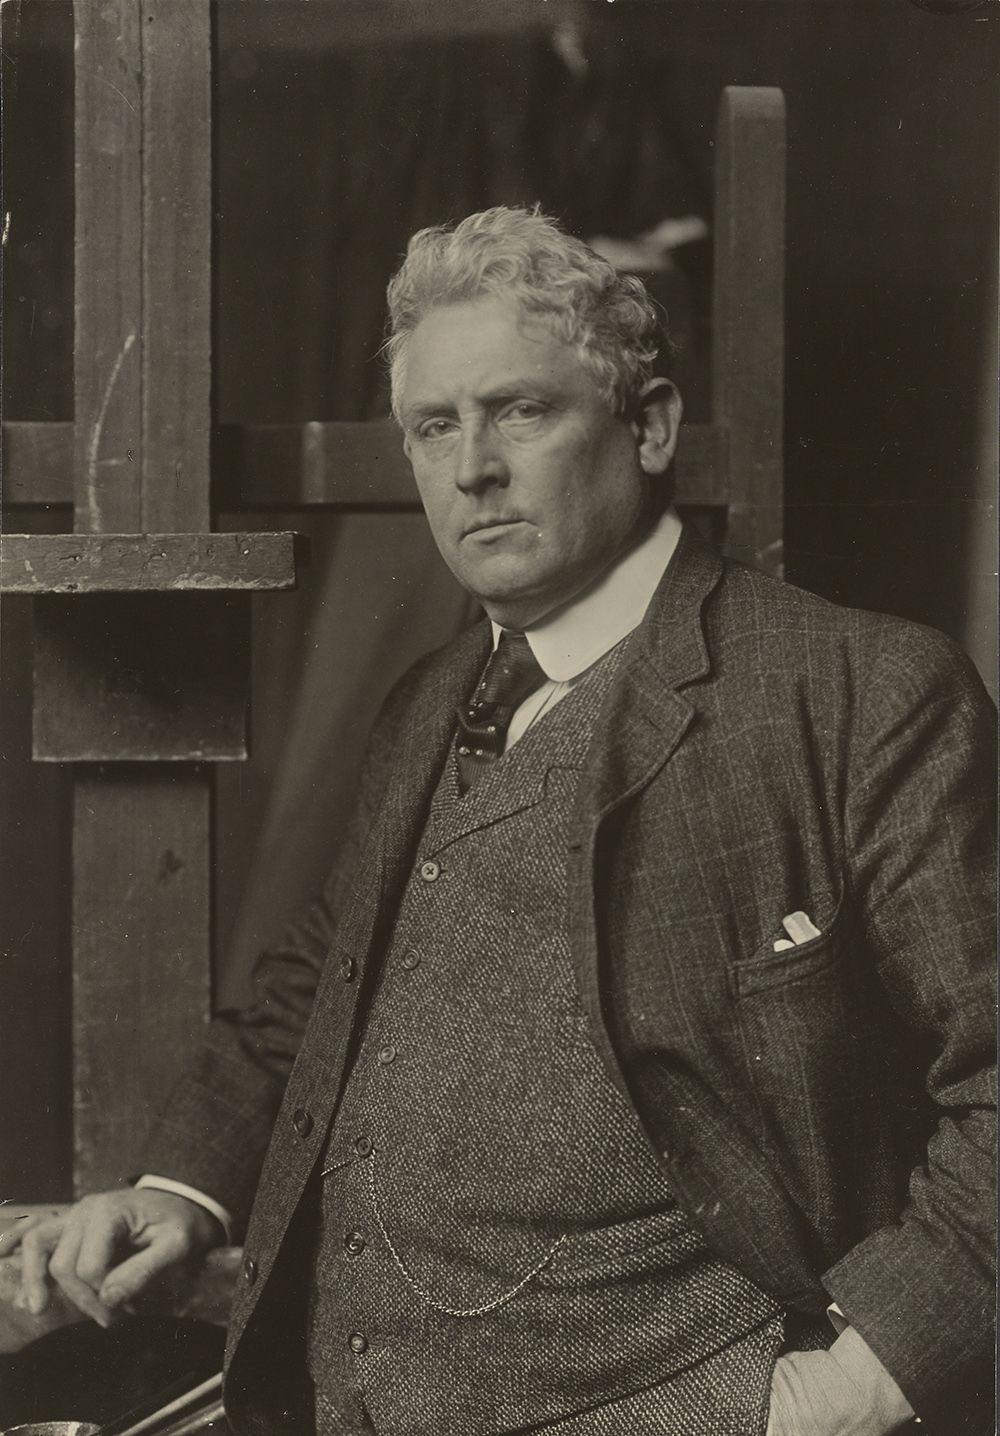 Julian Alden Weir in his studio wearing a suit and tie in a formal portrait.